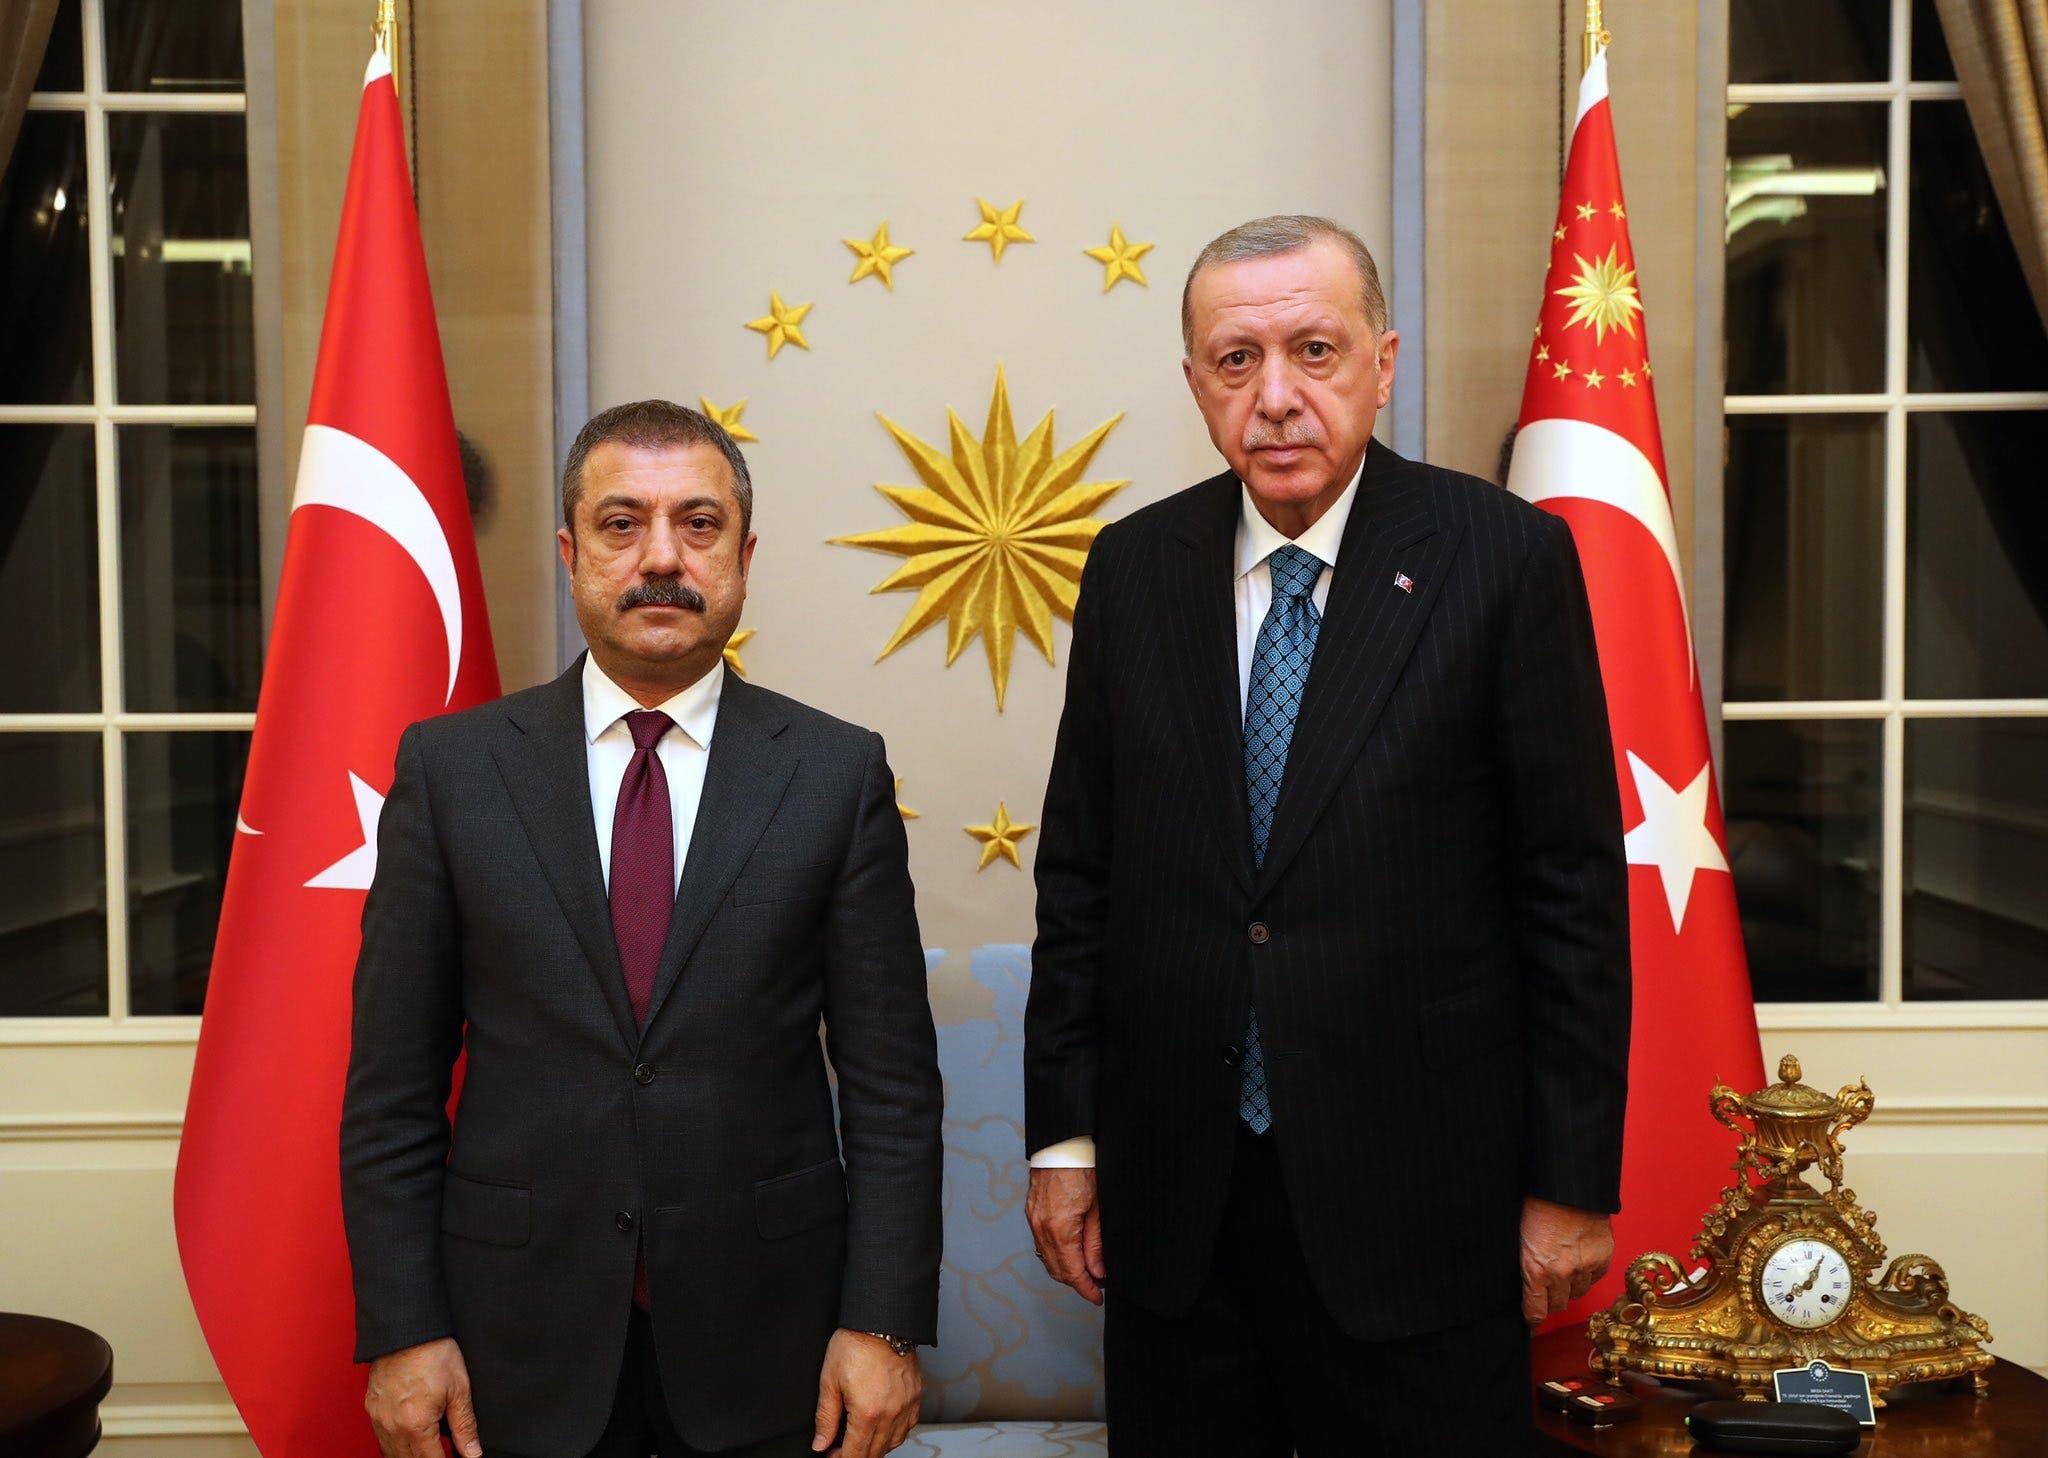 Turkey Central Bank governor Sahap Kavcioglu (left) with President Recep Erdogan (right) at the presidential mansion in Ankara. (Turkish presidency via Twitter)